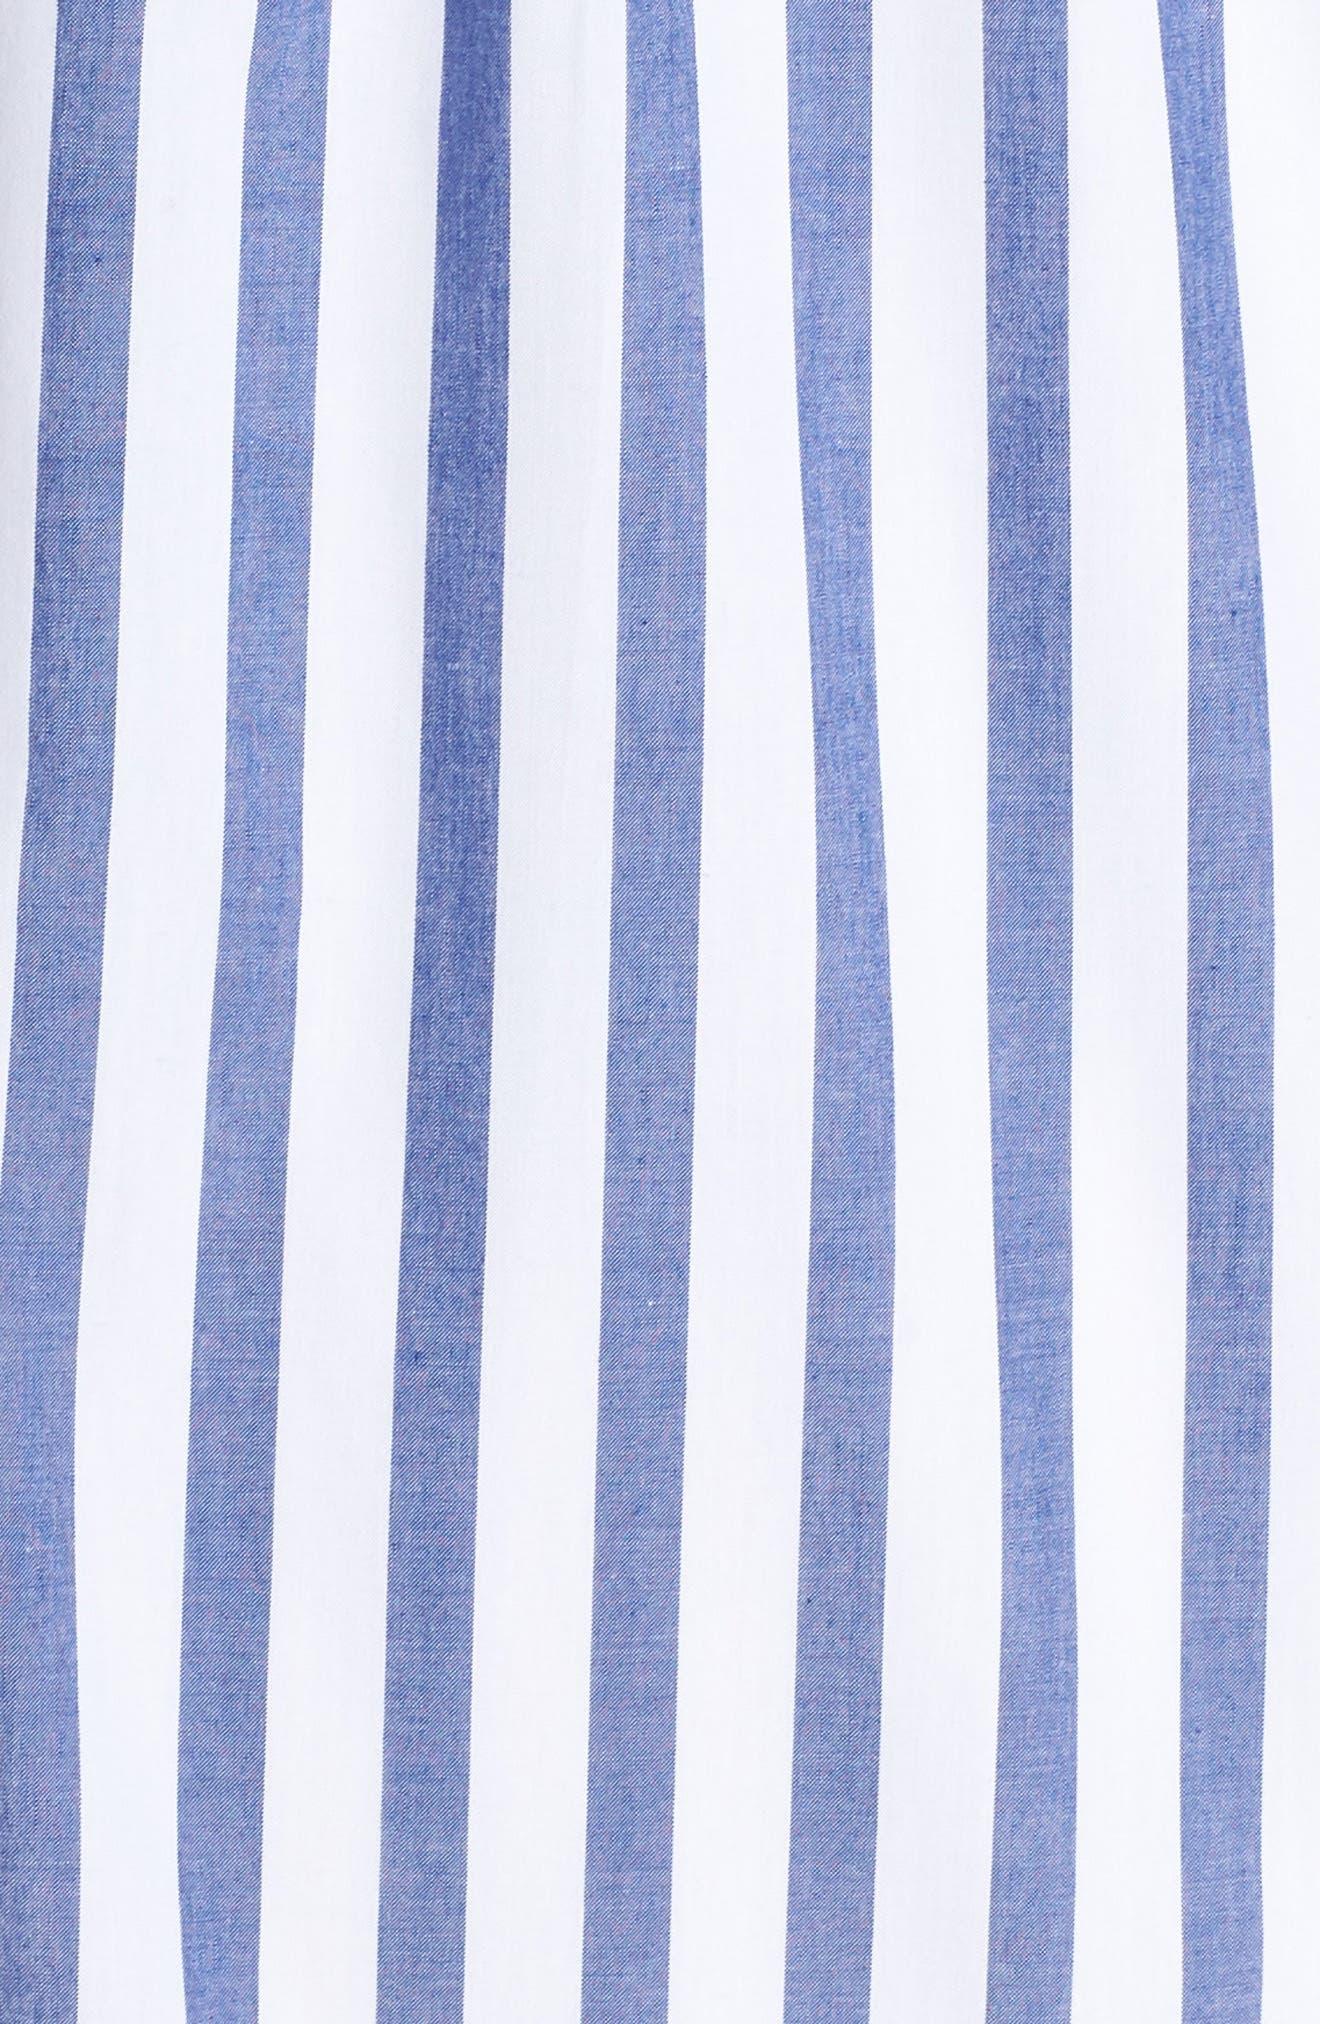 Stripe Bib Front Sleeveless Shift Dress,                             Alternate thumbnail 6, color,                             Ivory/ Blue Stripe